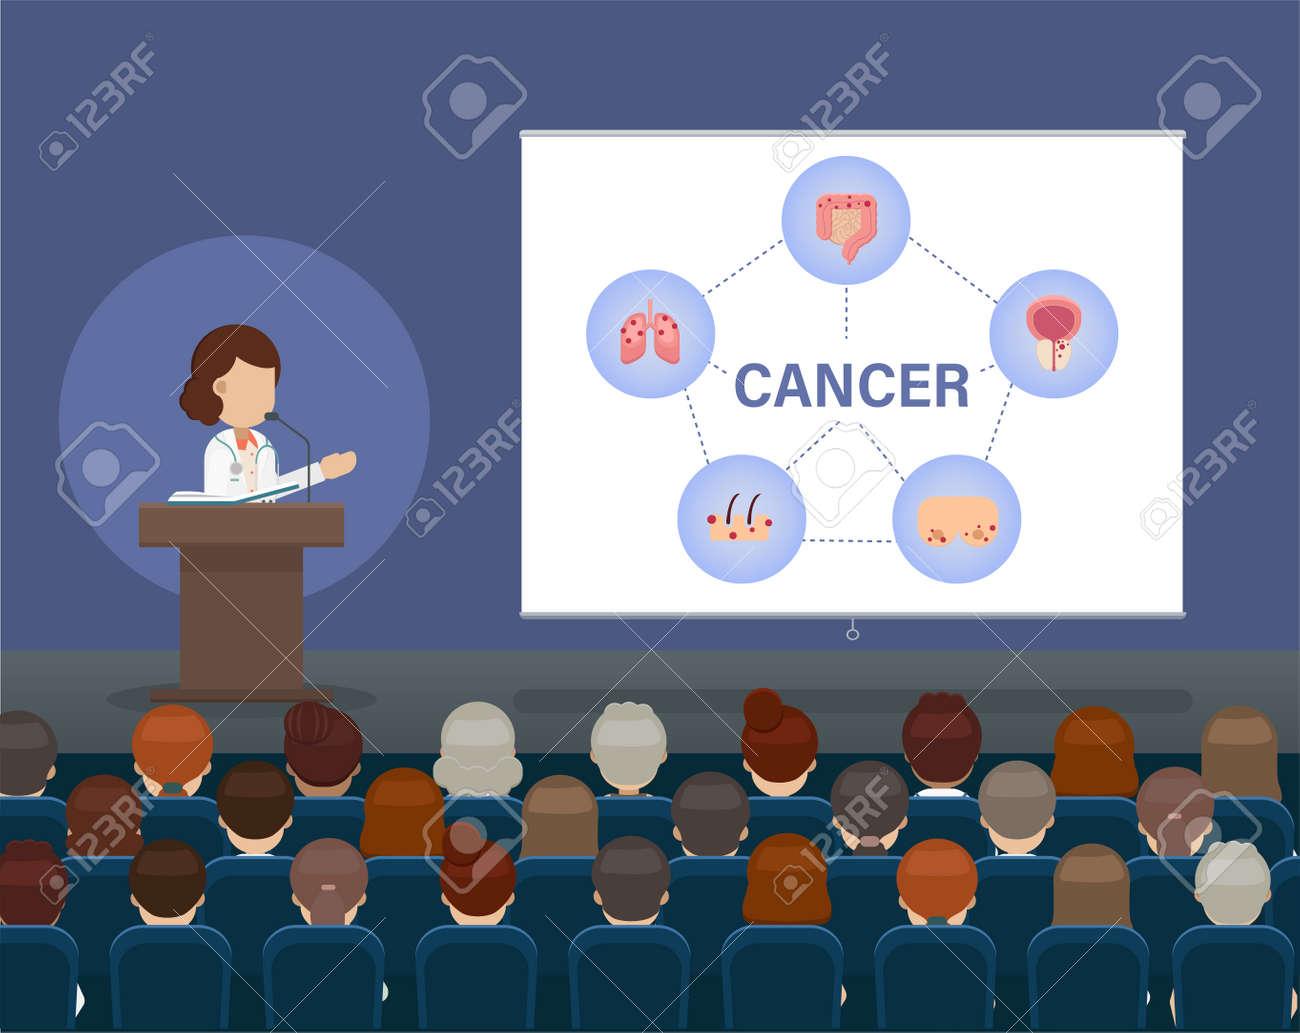 Medical conference concept with doctor speak on stage illustration - 159374652